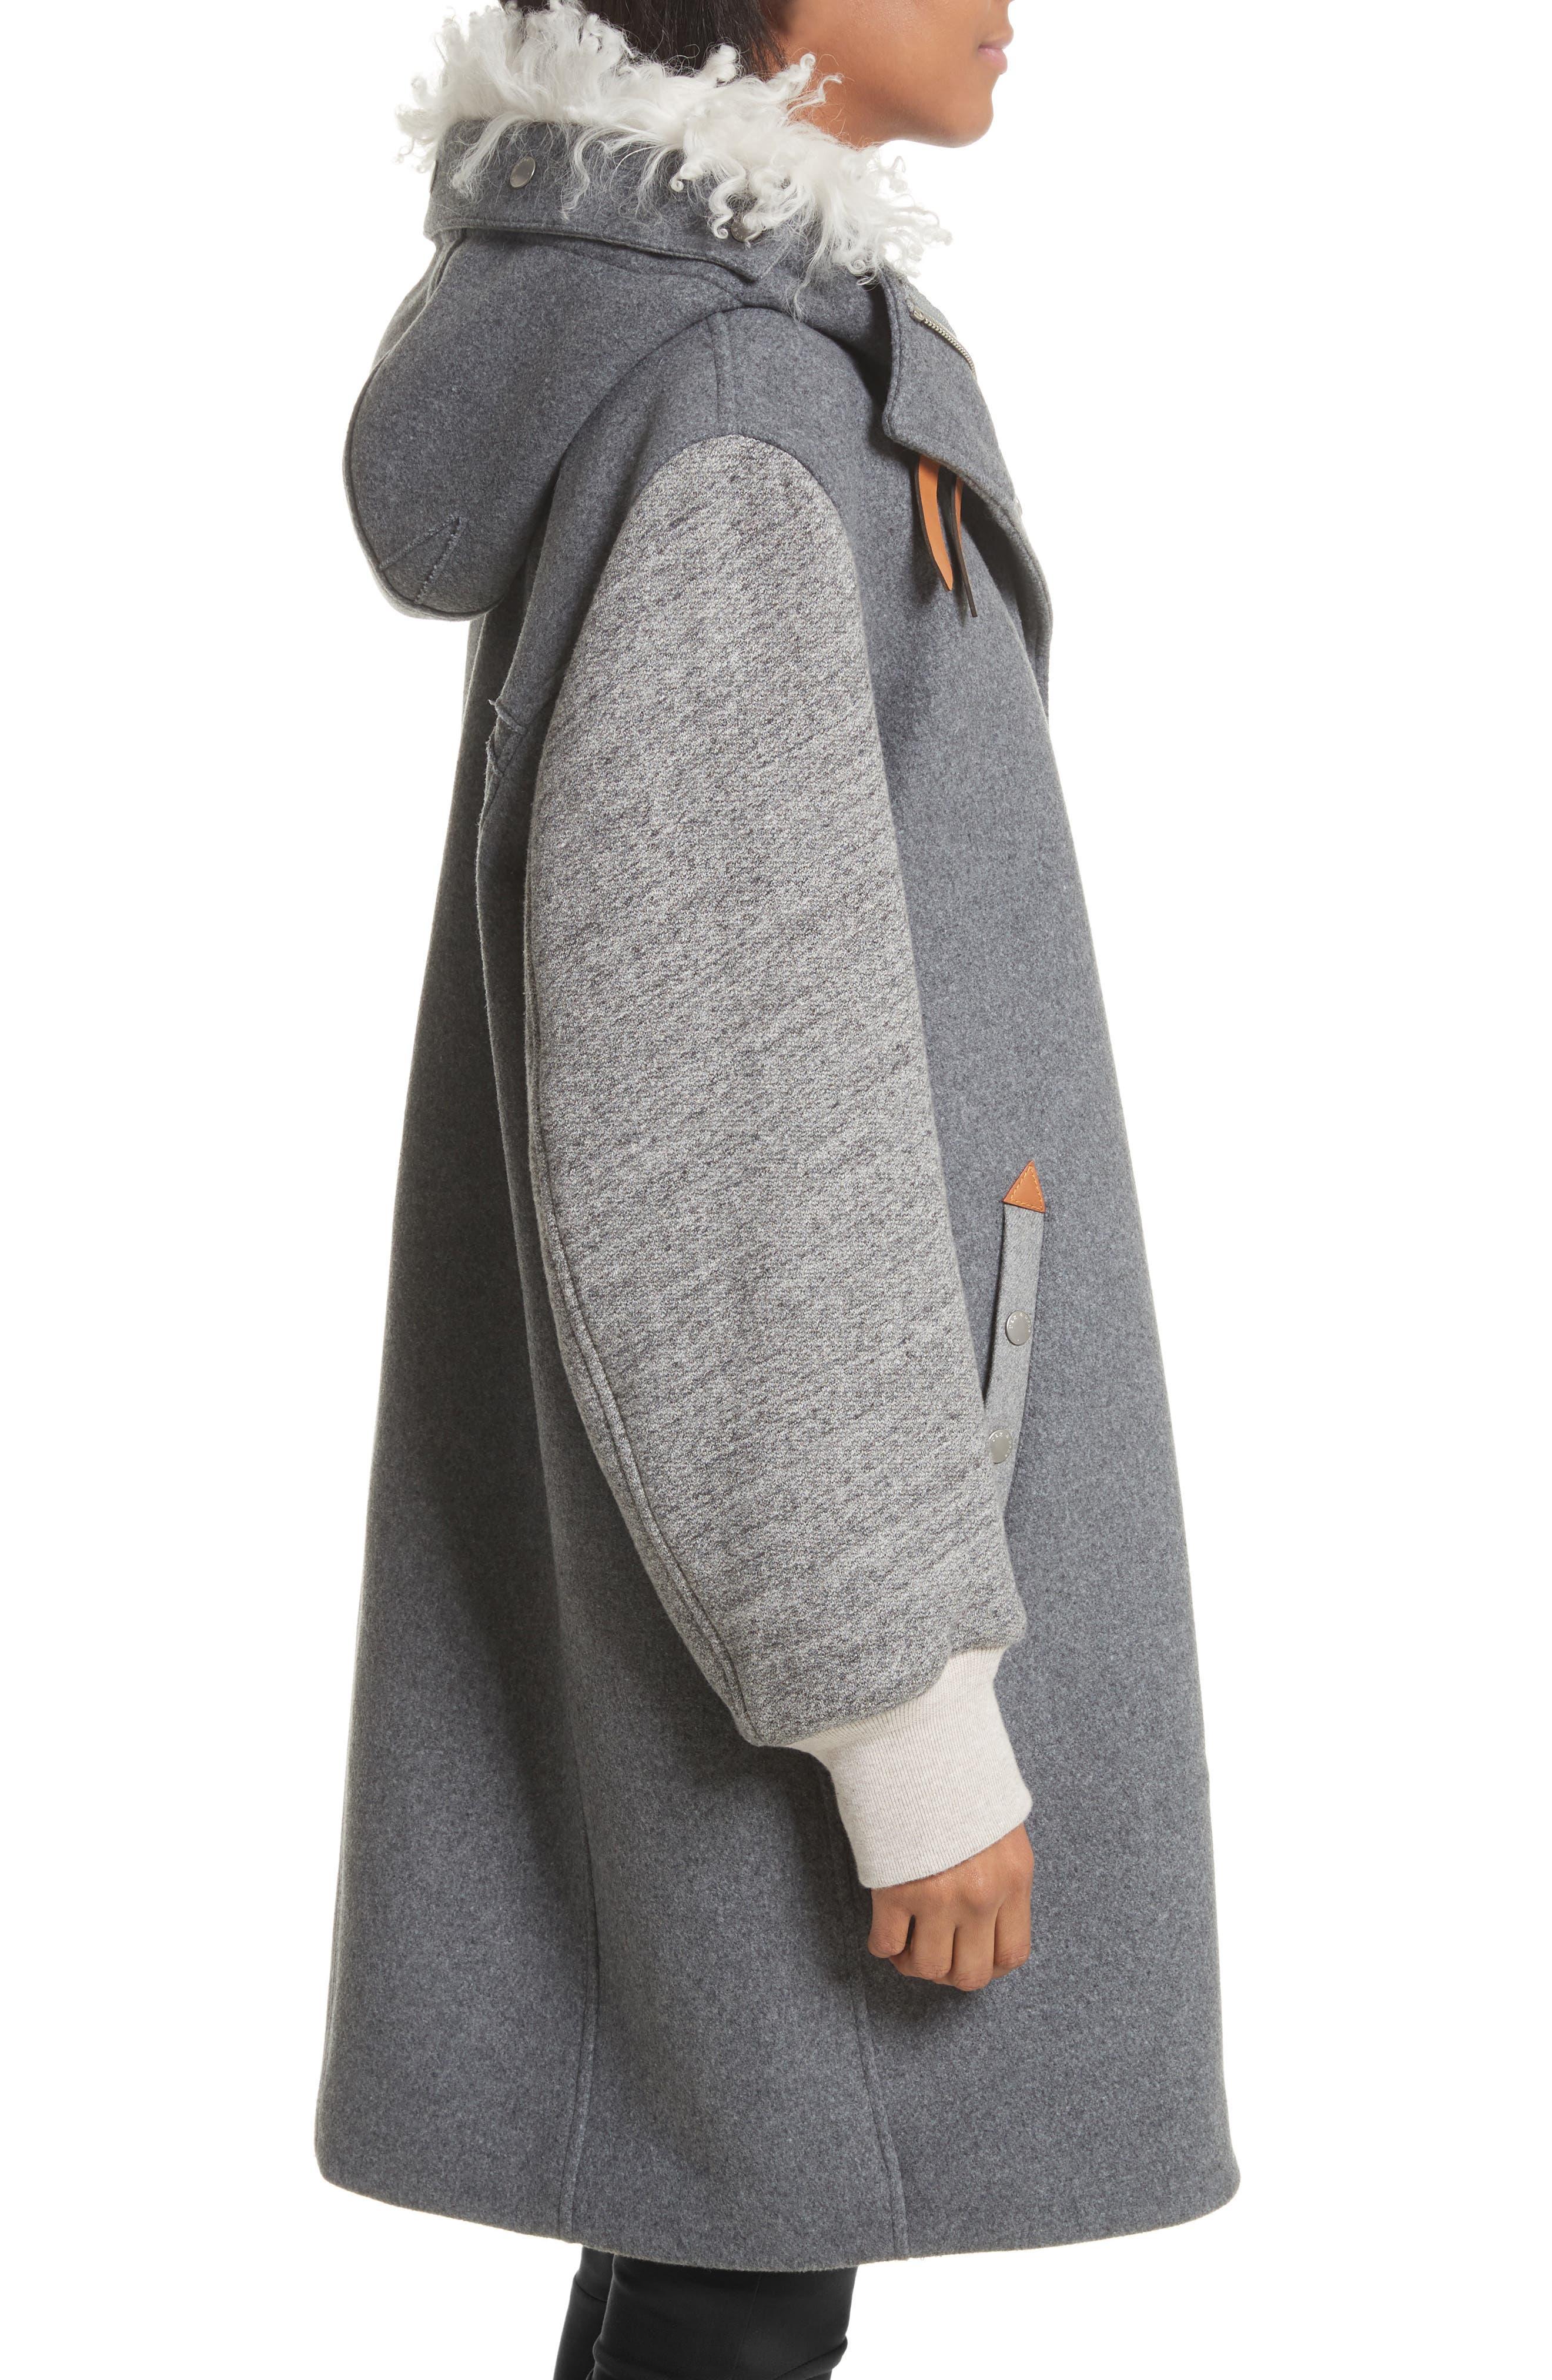 Laporta Genuine Shearling Trim Wool Blend Hooded Coat,                             Alternate thumbnail 4, color,                             Dark Grey